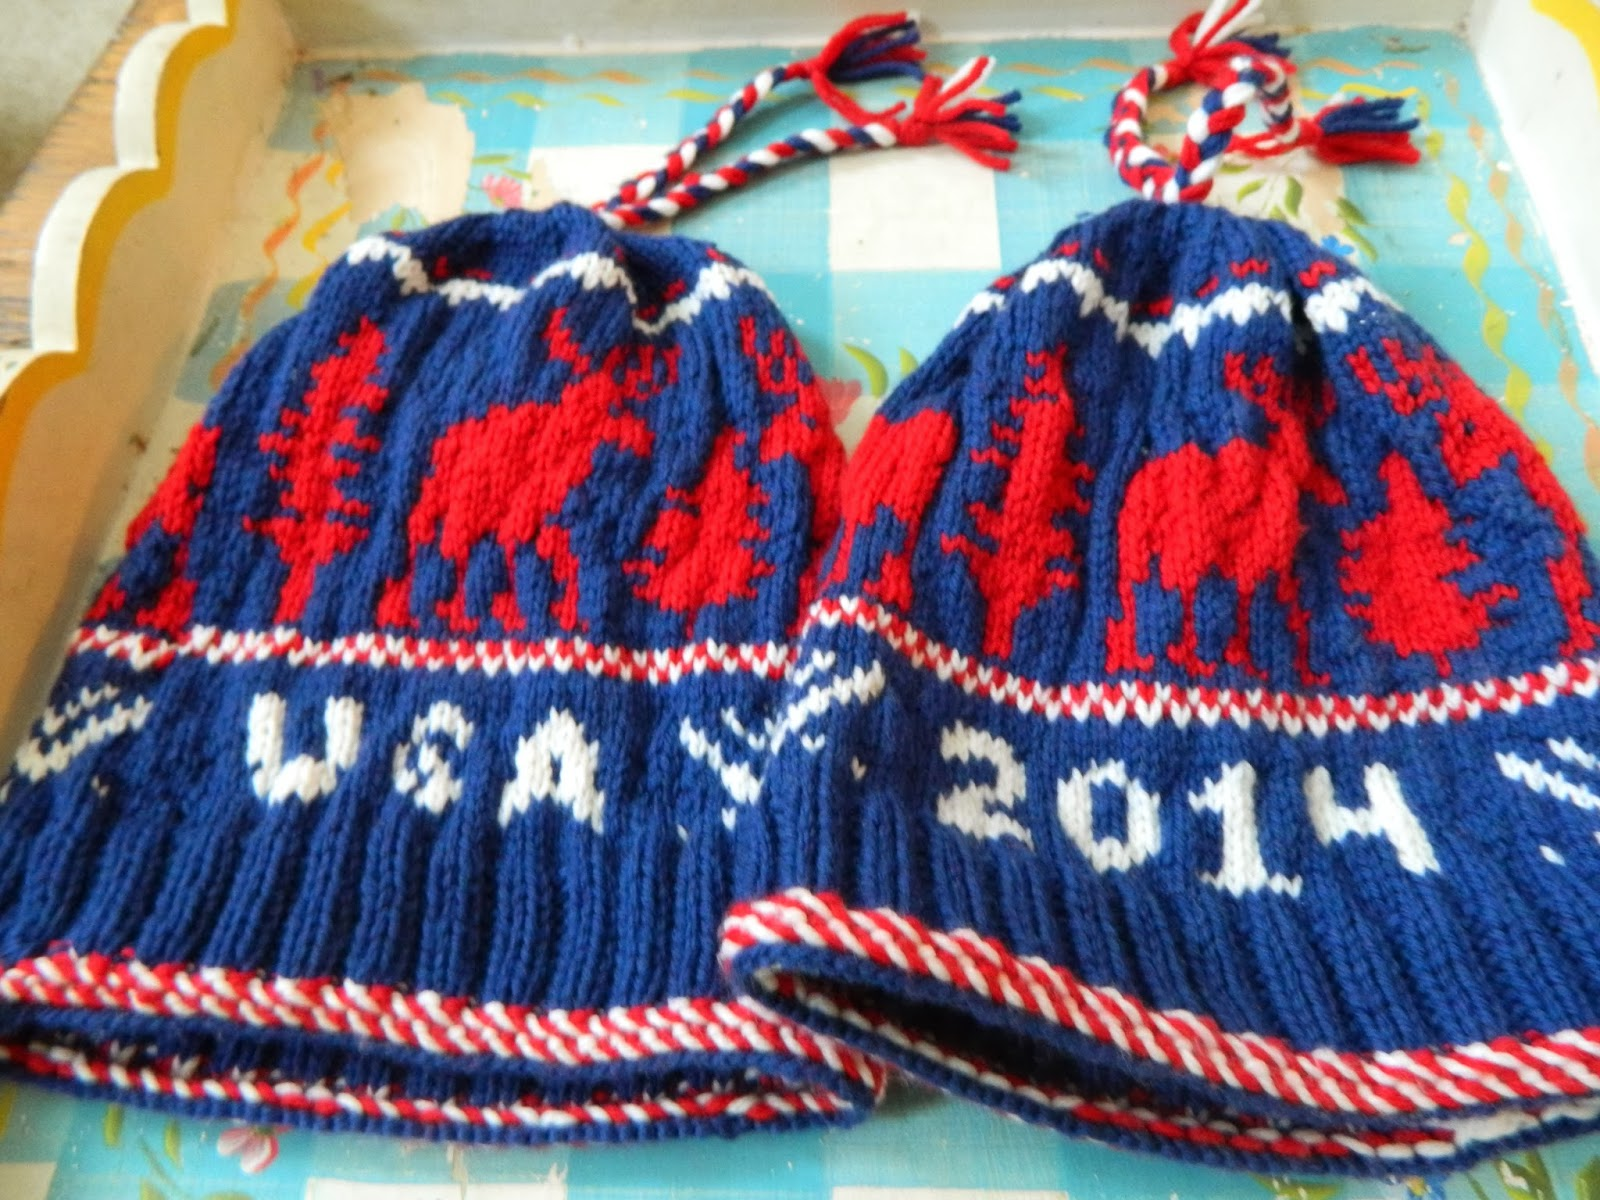 Knitting Olympics Ravelry : The vintage umbrella olympic knitting